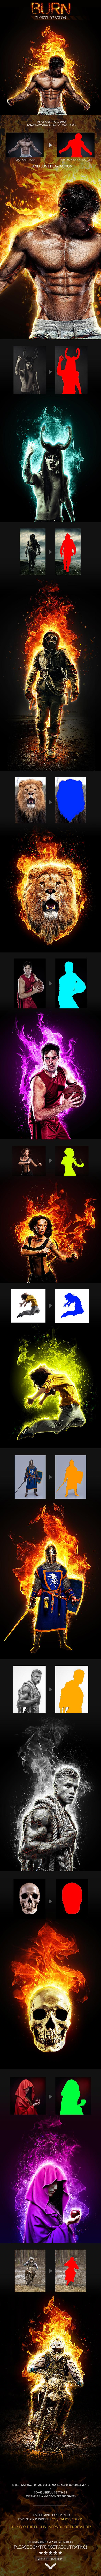 GraphicRiver Burn Photoshop Action 11462943